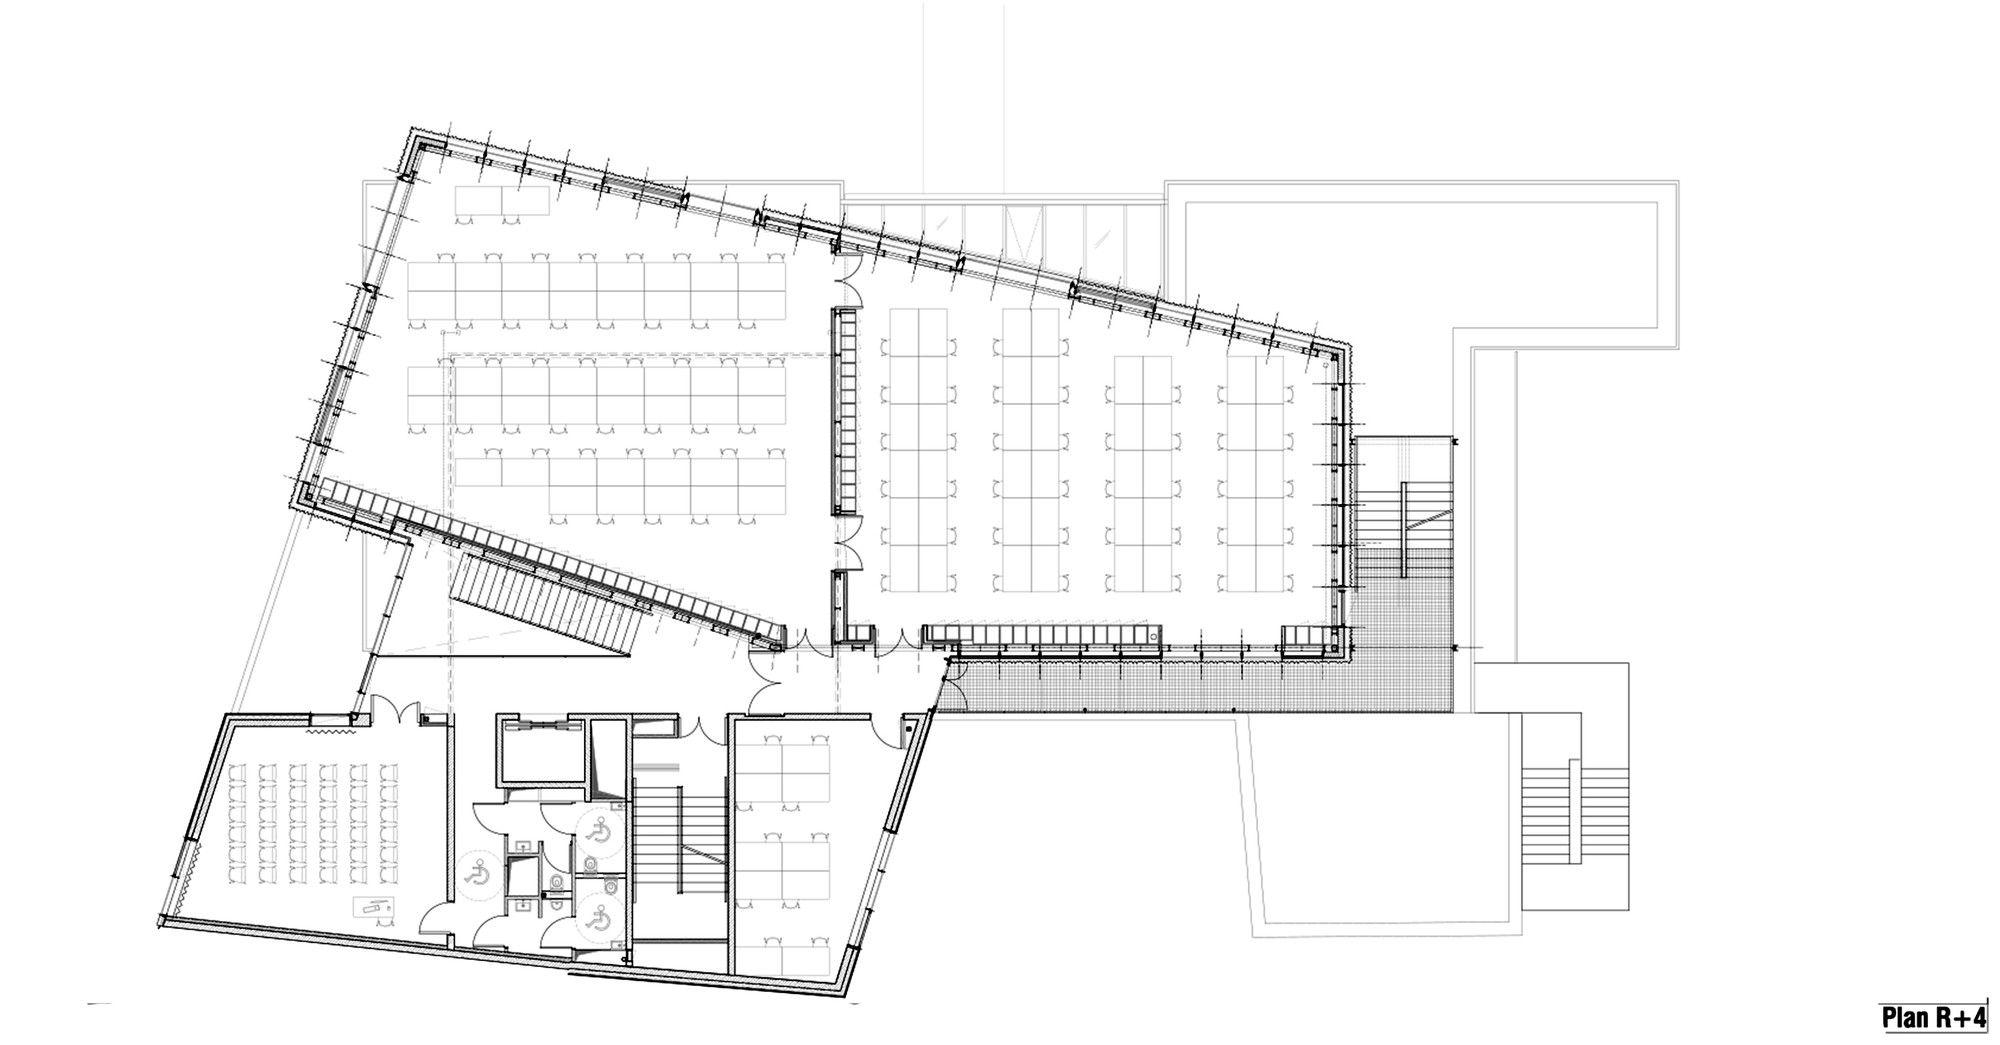 Architecture School Plan gallery of strasbourg school of architecture / marc mimram - 13